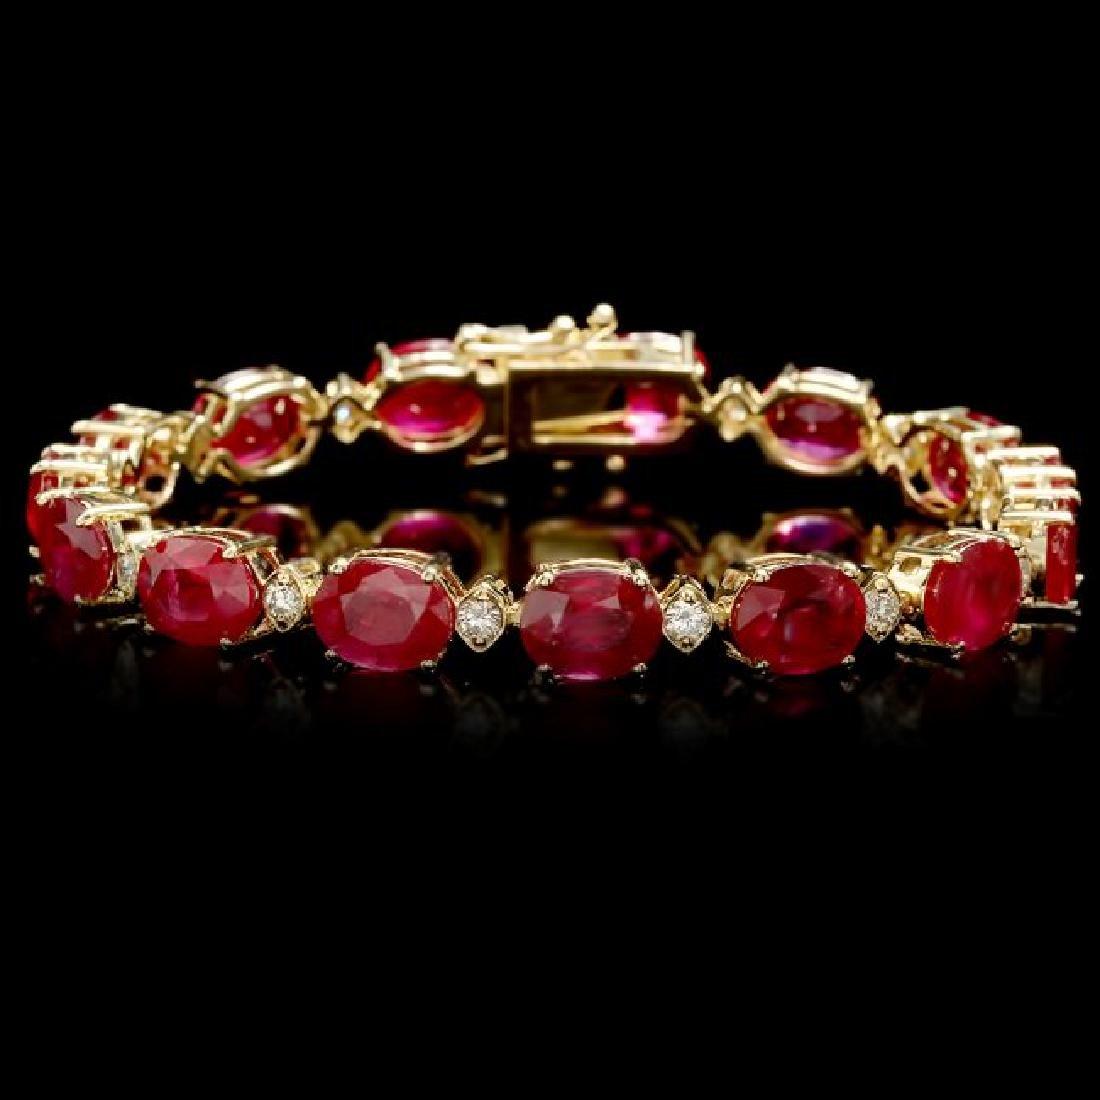 14k Gold 34.50ct Ruby 1.15ct Diamond Bracelet